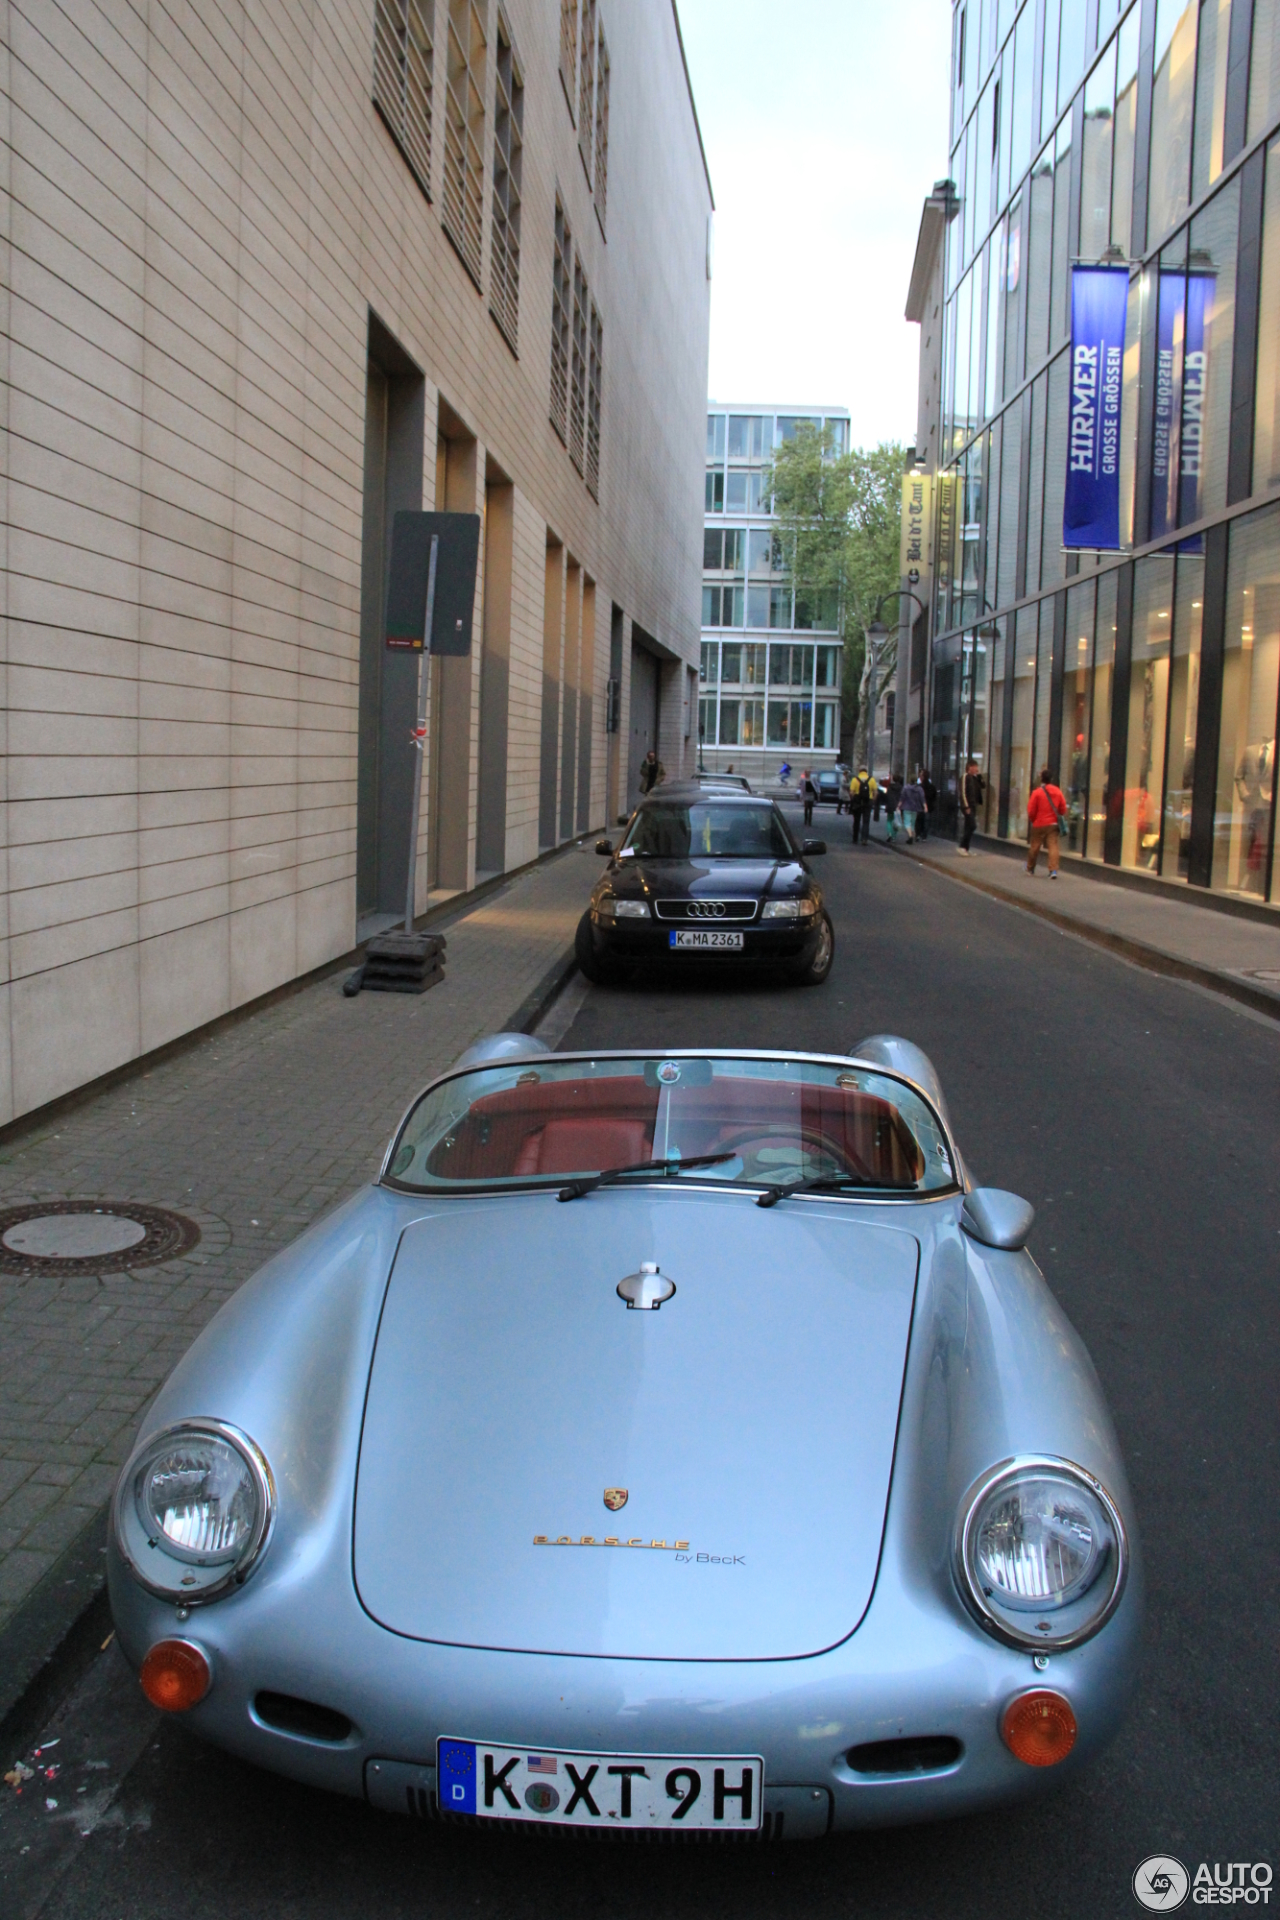 4 i porsche 550 spyder 4 - Porsche Spyder 550 2014